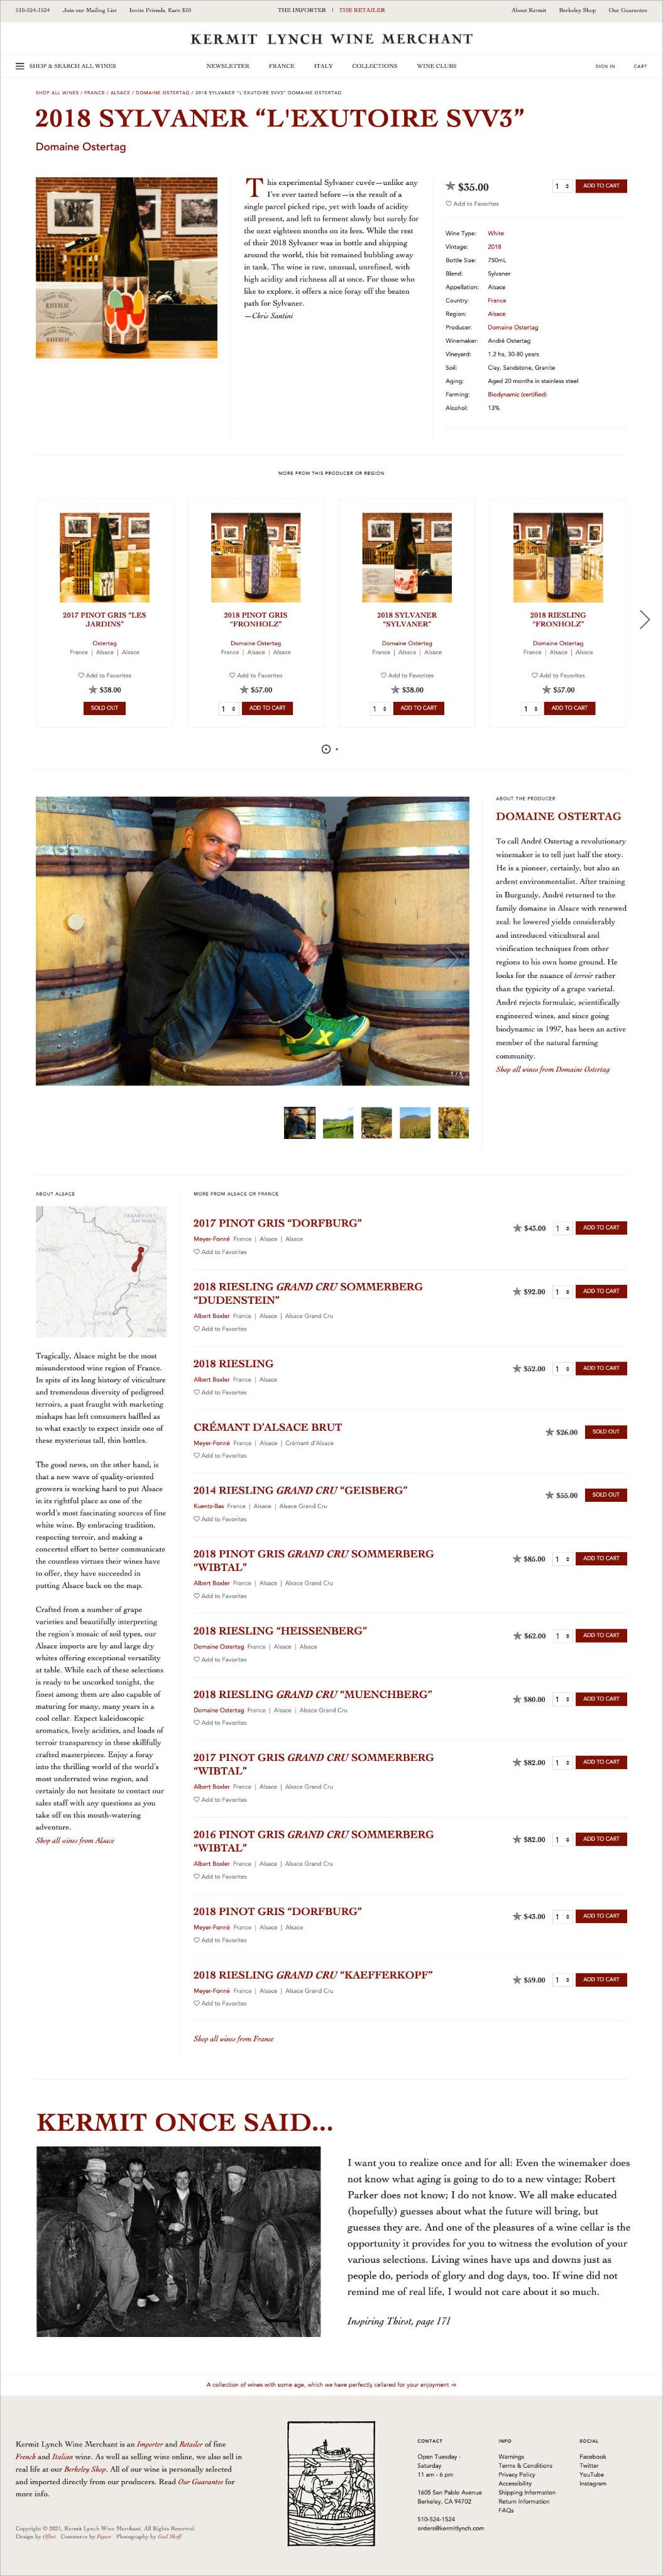 Kermit Lynch Wine Merchant Product Page